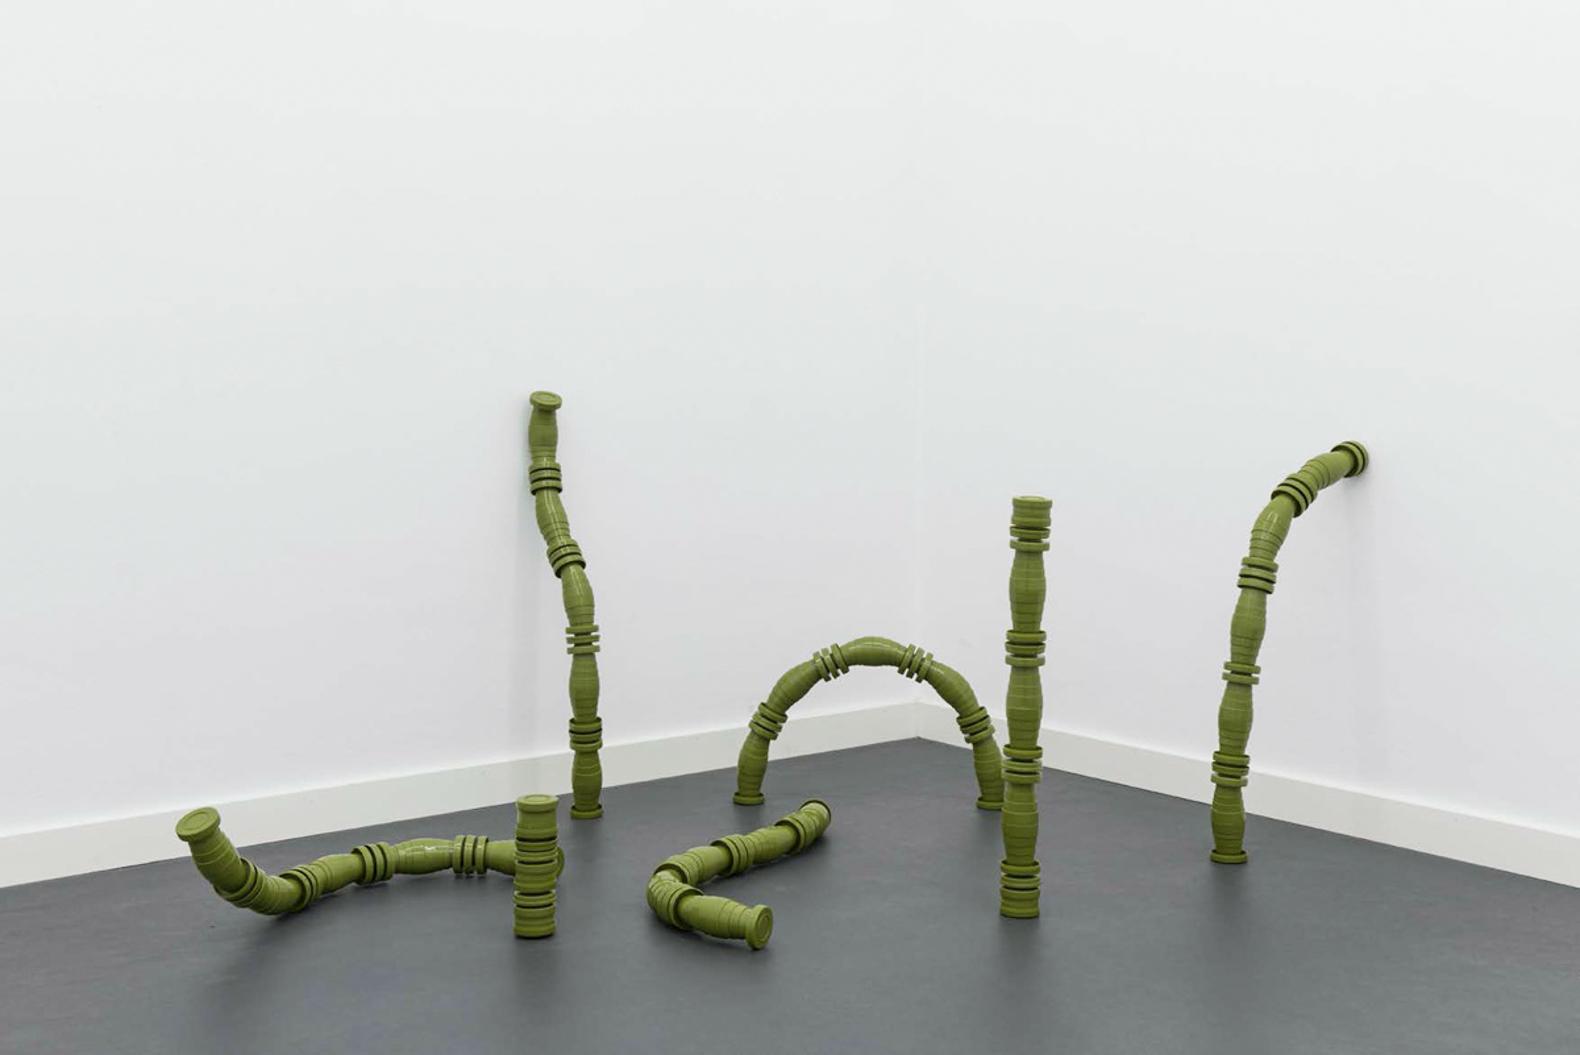 Collapsible units, 2014. Courtesy of the artist and García Galería, Madrid ES.